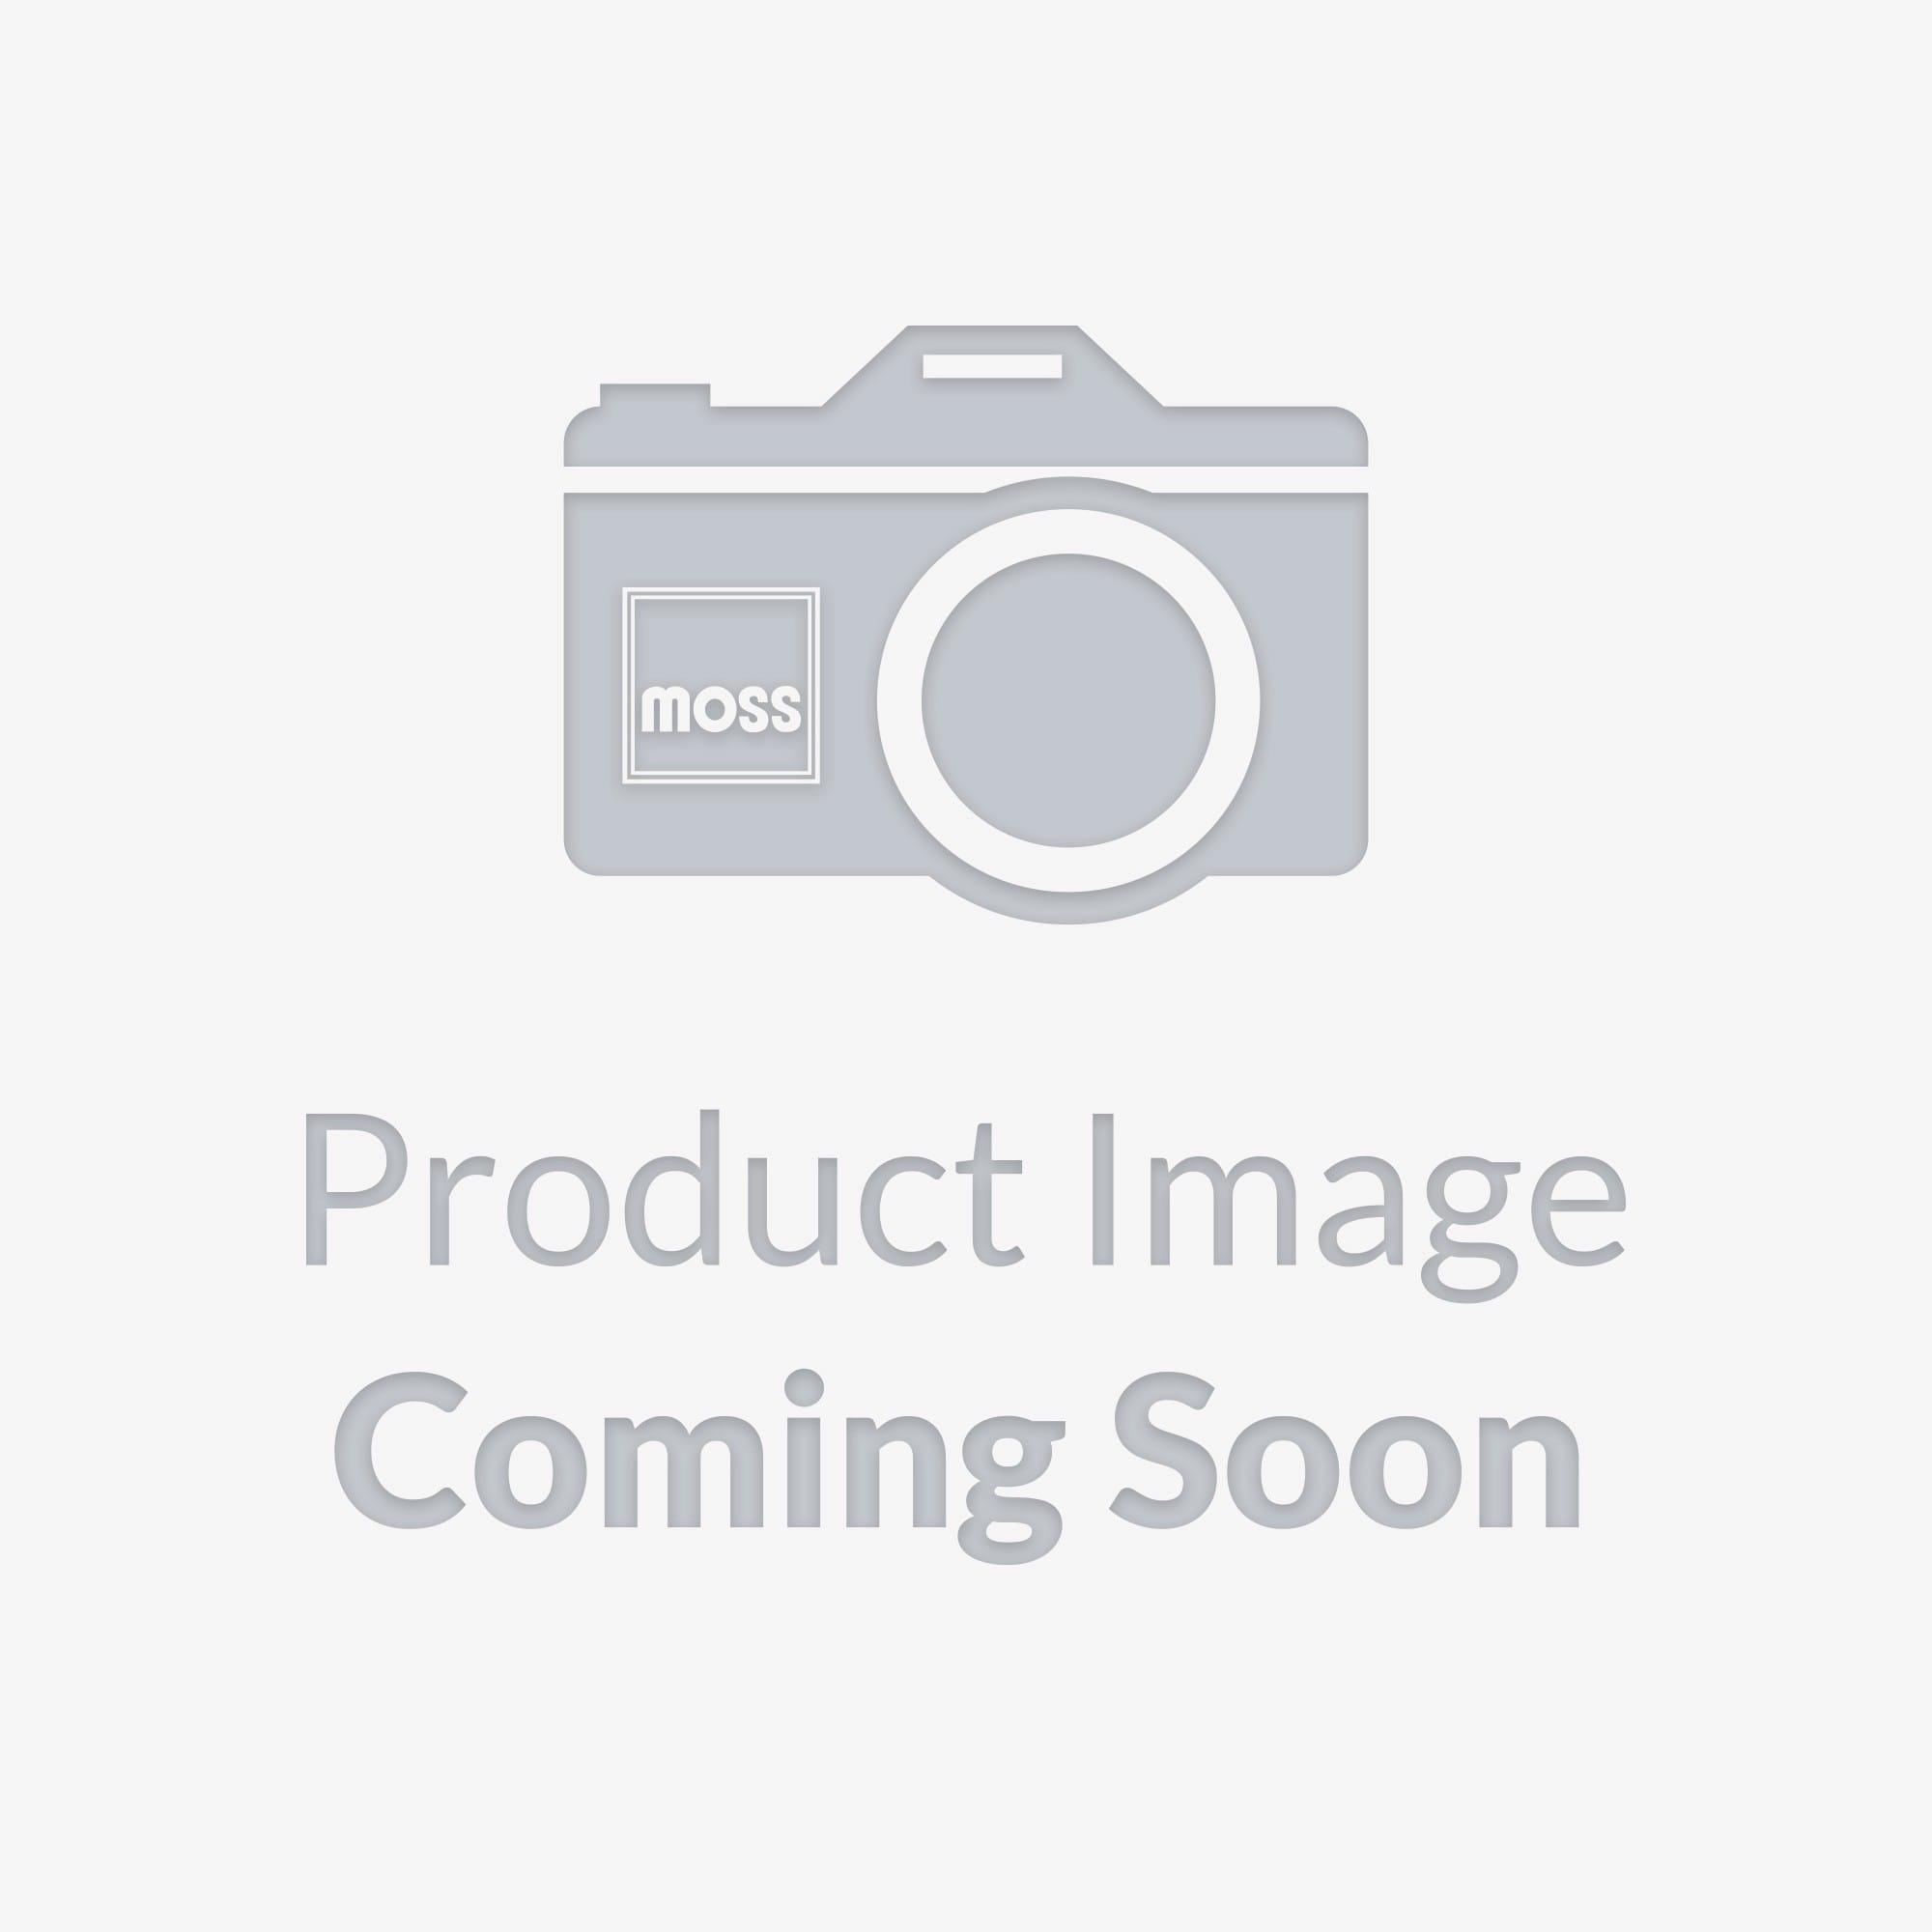 Eurosport Seat Covers Seats Covers Etc Interior